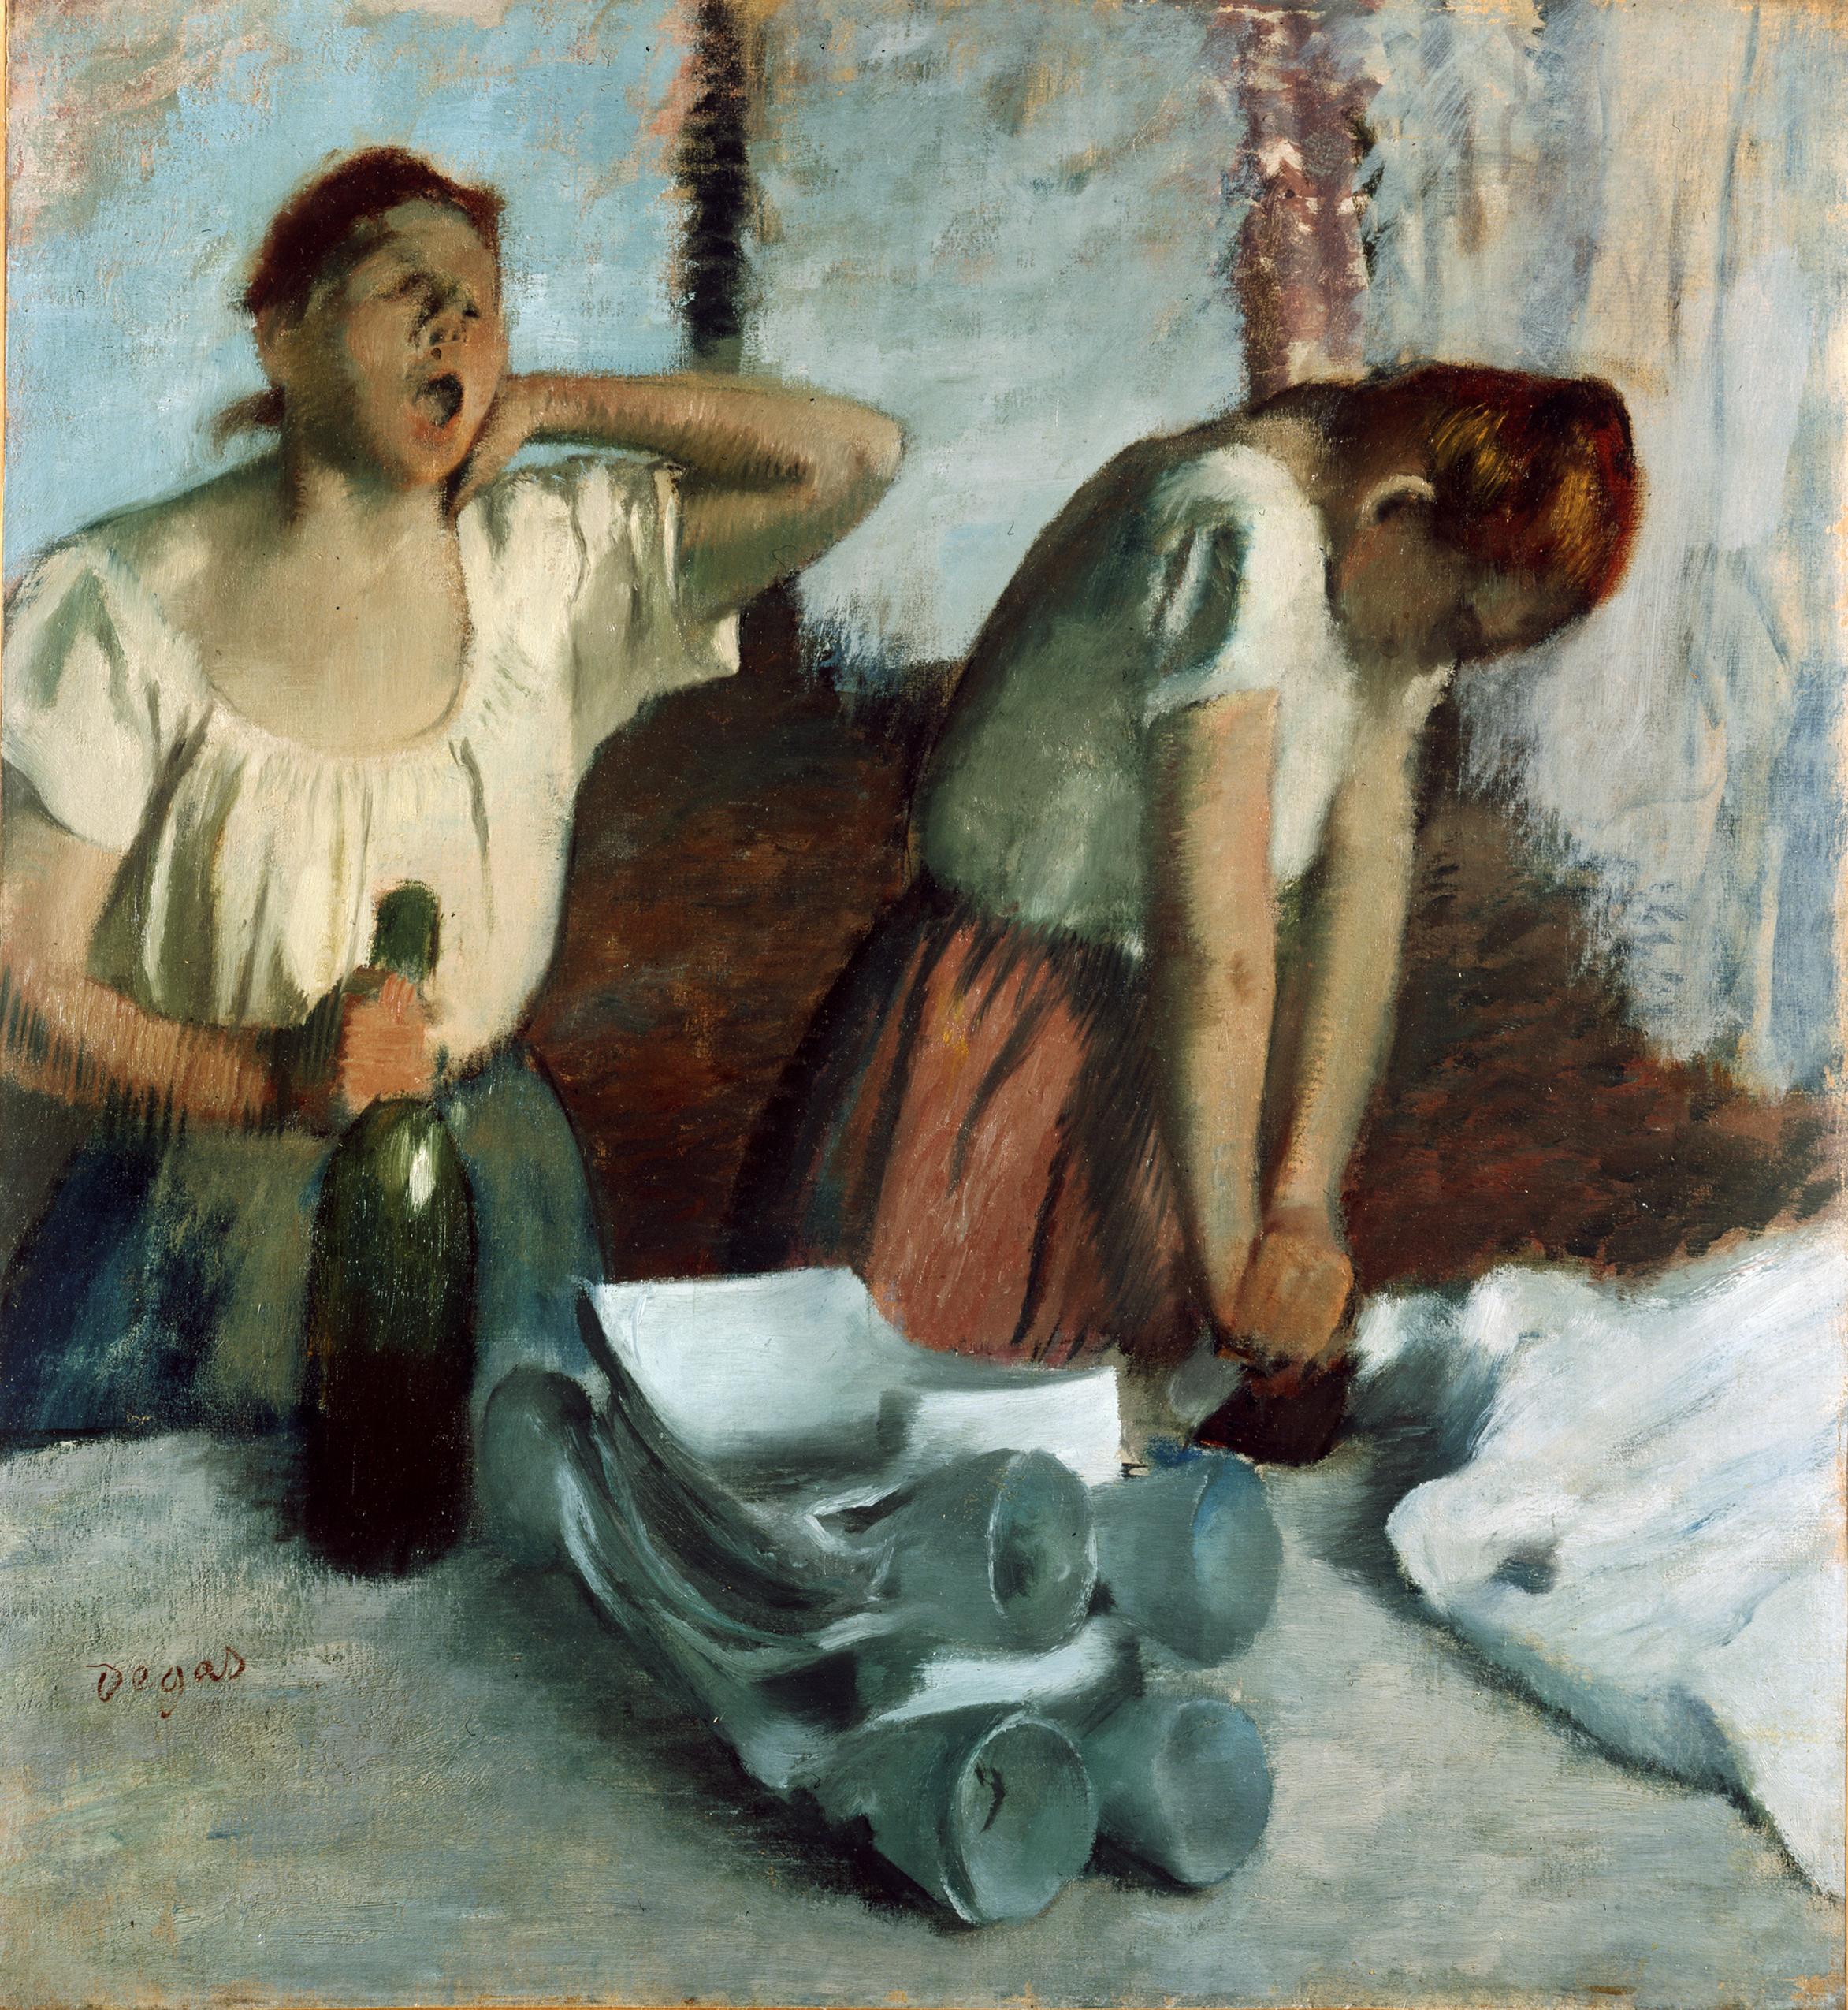 Edgar Degas,Woman Ironing,Clothing store framed printing,Framed Prints,wall art prints,Hanging Canvas print,large wall art oversized,f434